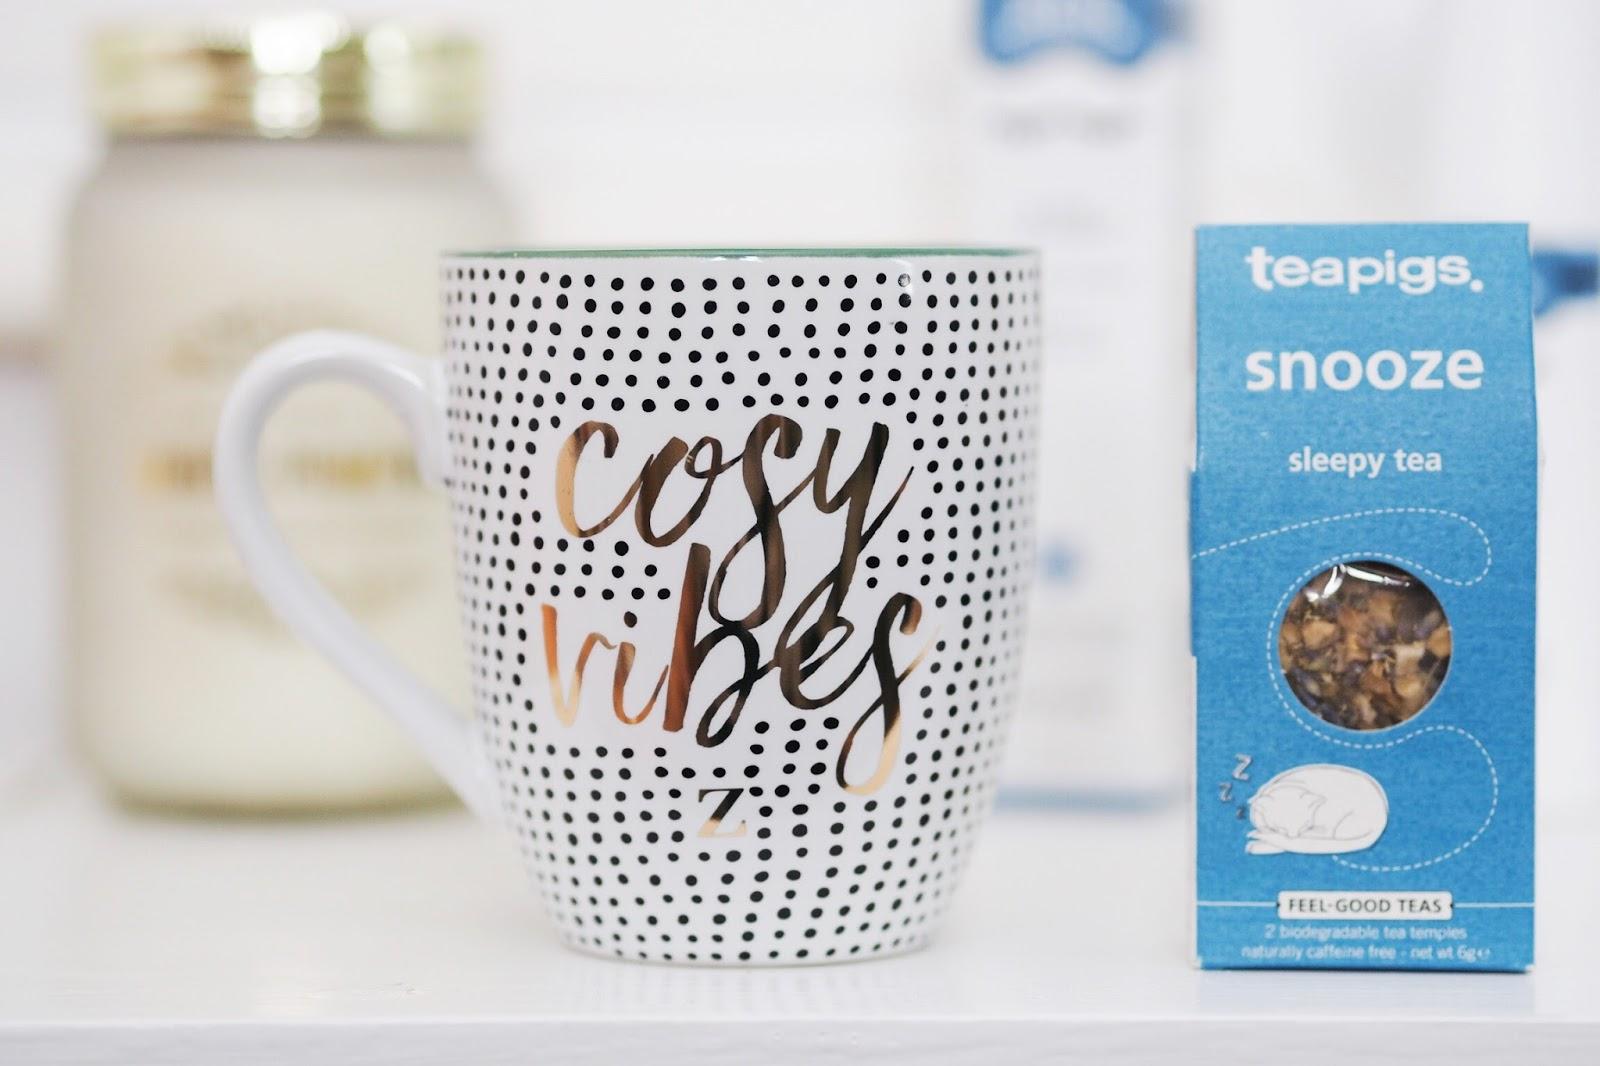 REN and now to sleep pillow spray review zoella lifestyle mug